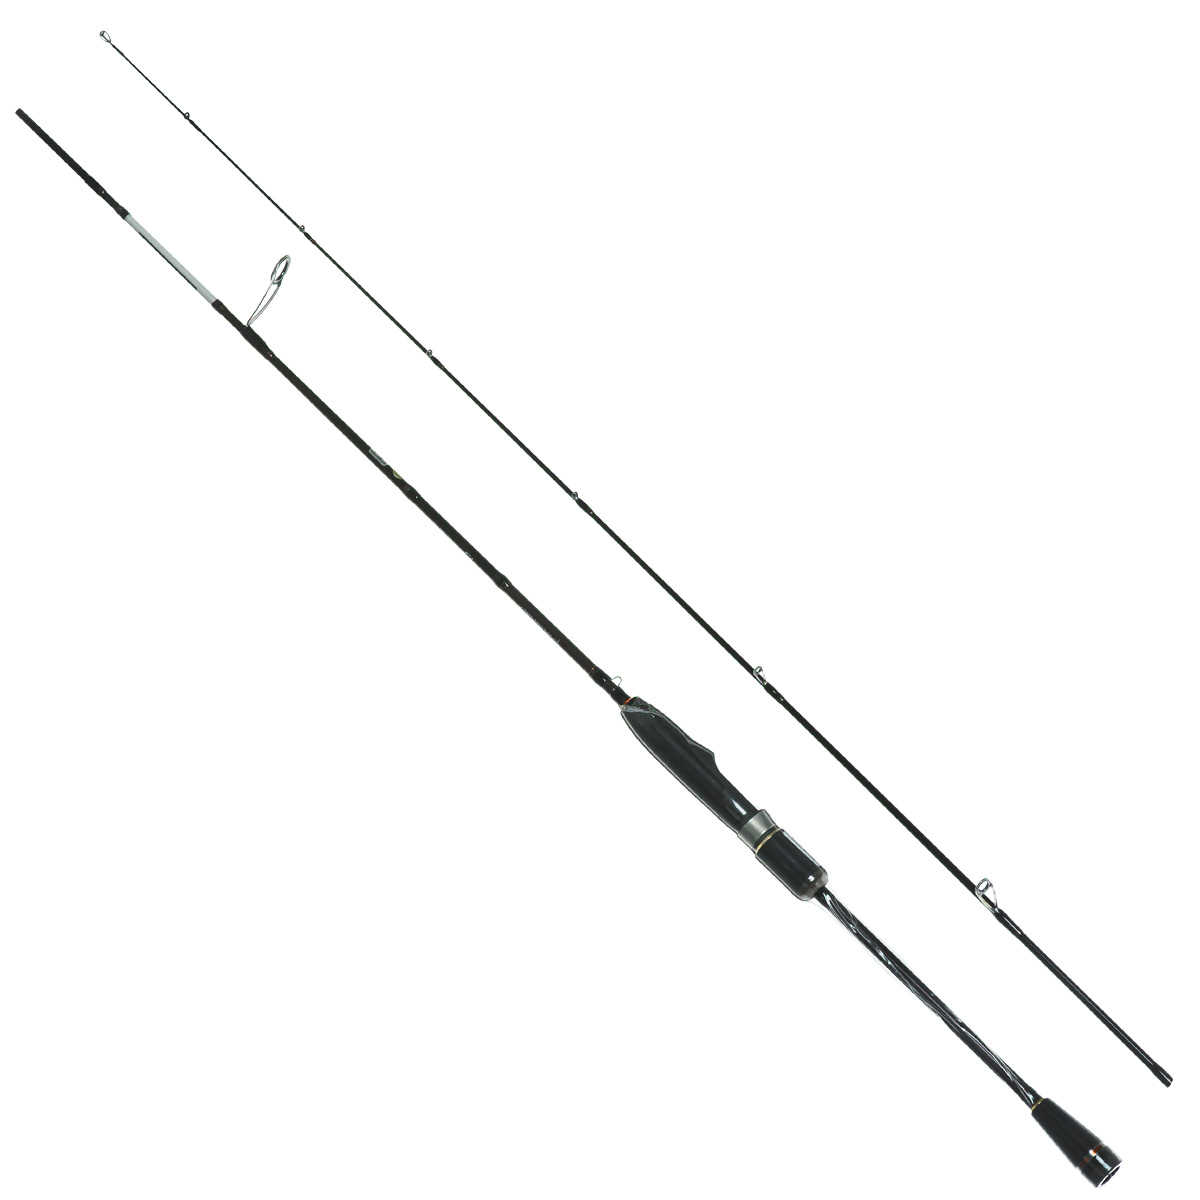 Удилище спиннинговое Tsuribito-Jackson Sweetwater, 1,83 м, 1-7 г